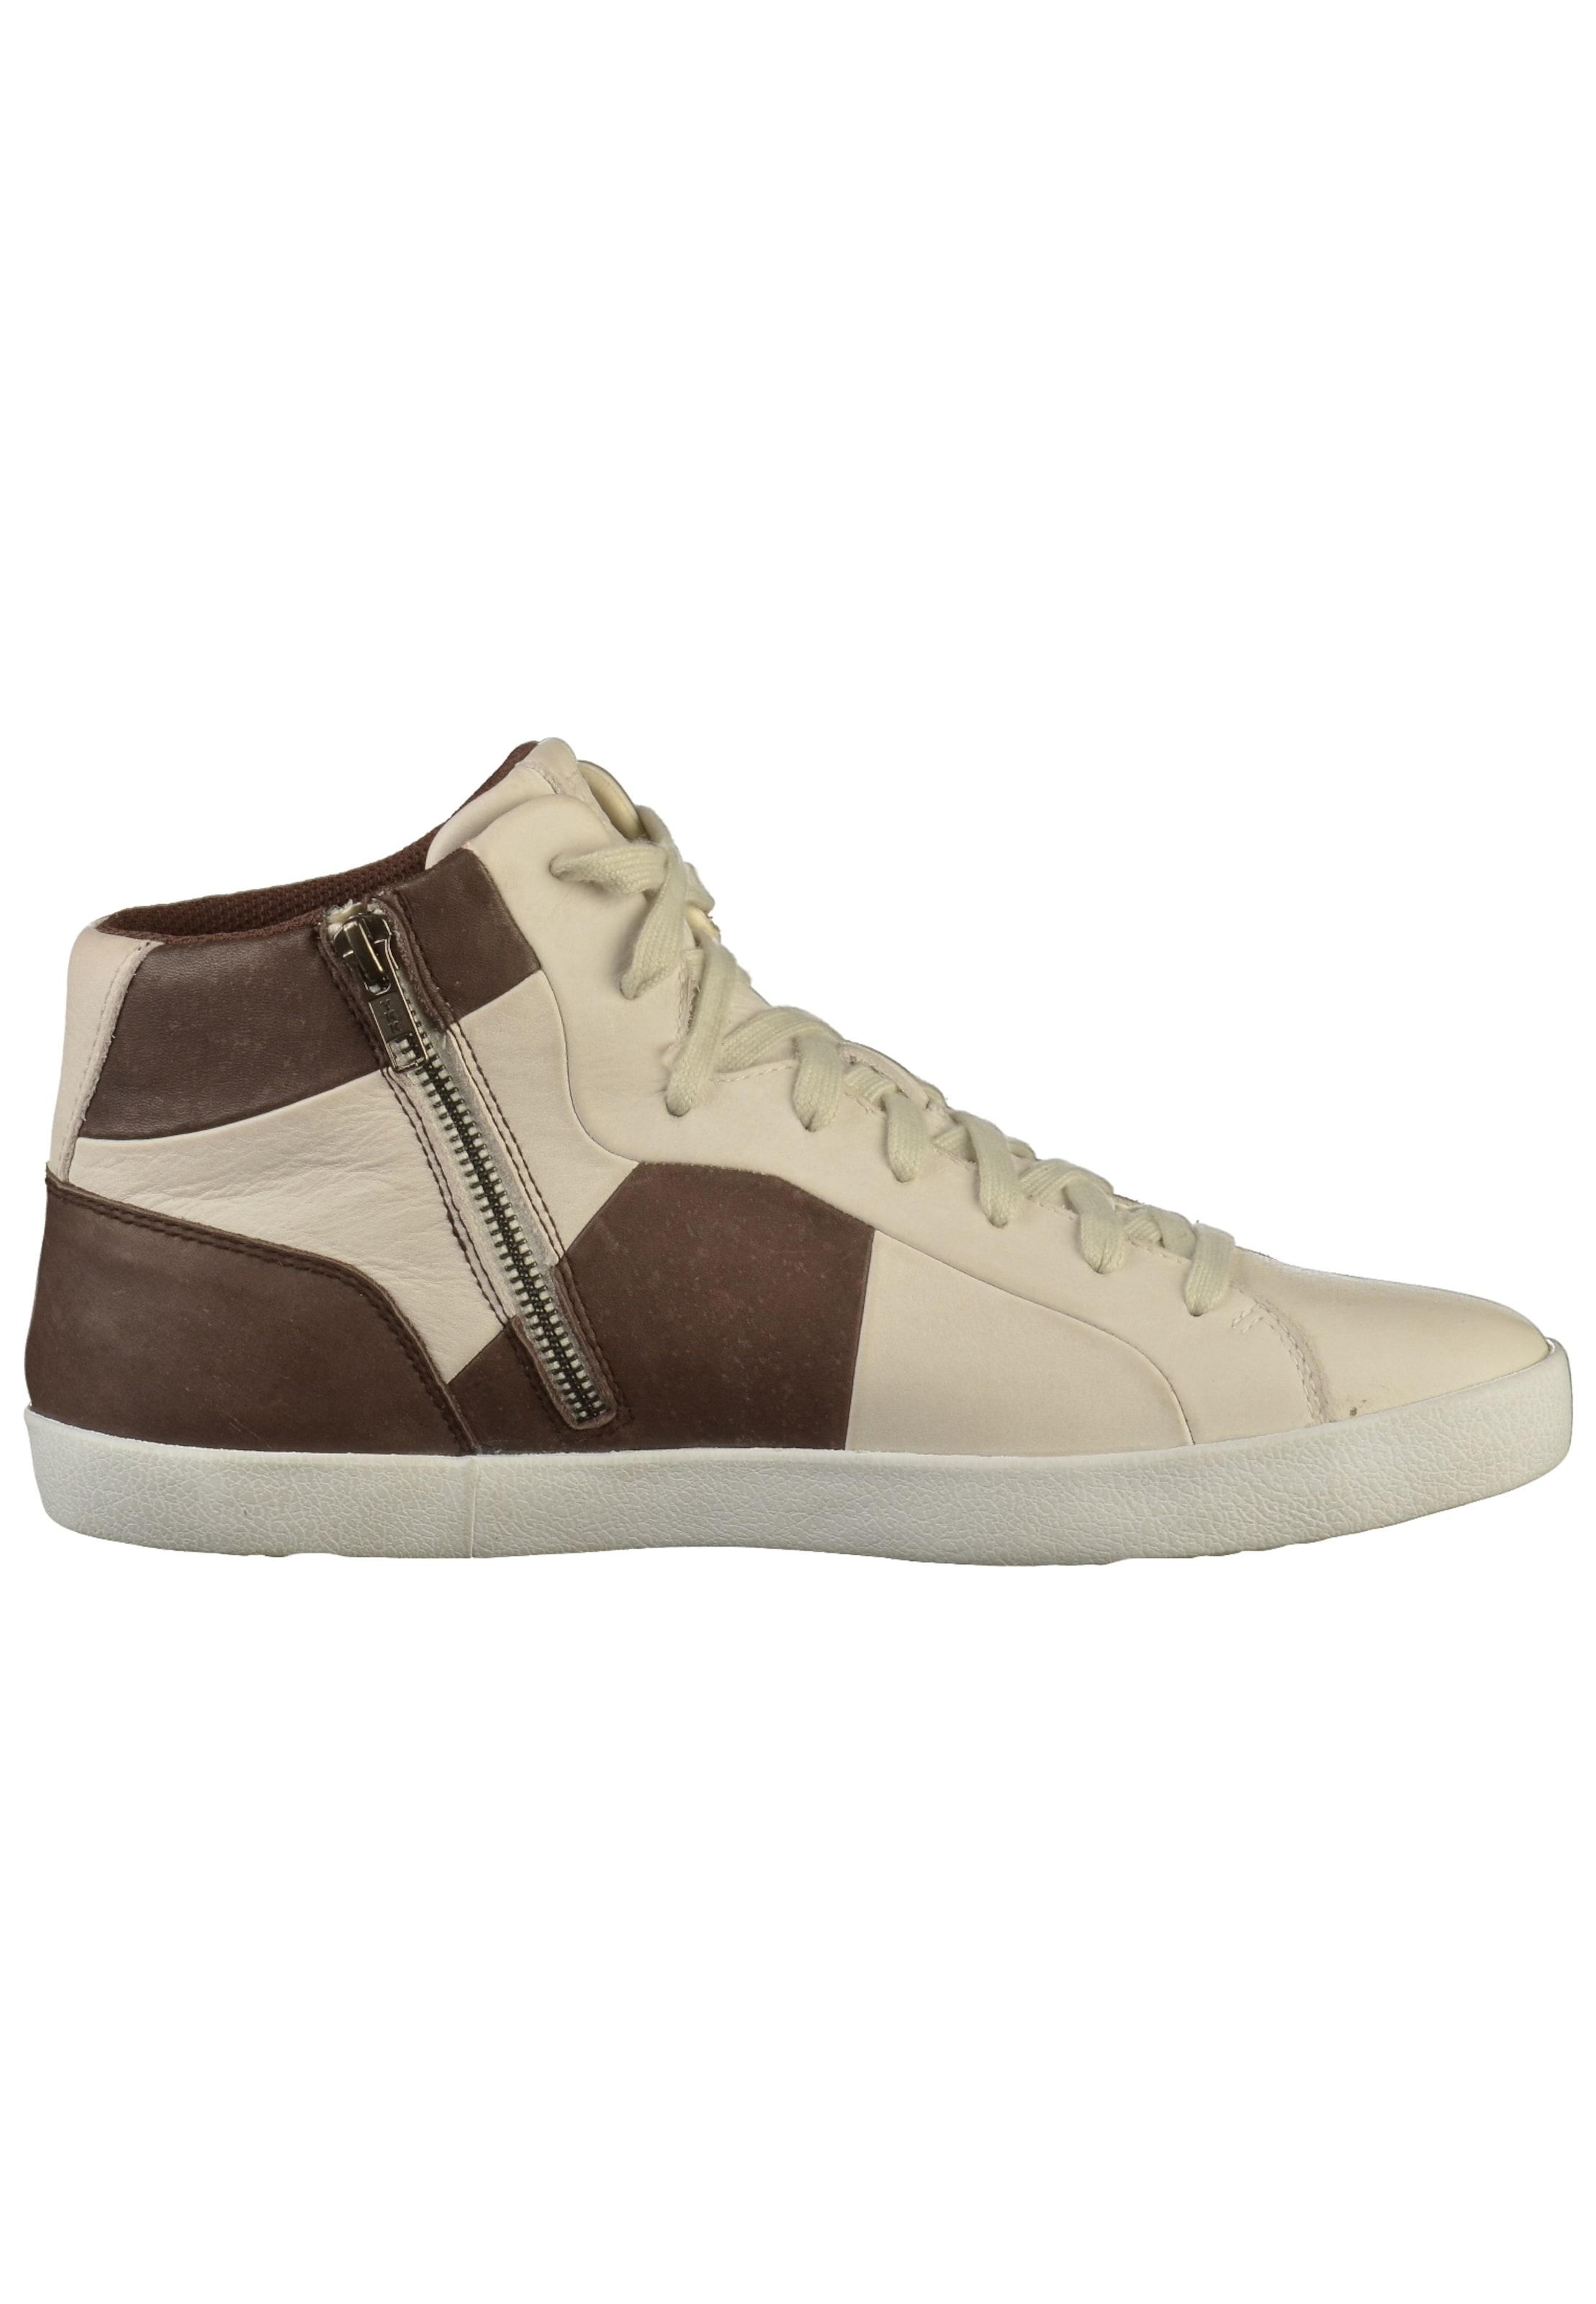 Sneaker In Sneaker BraunNaturweiß In Sneaker BraunNaturweiß Geox Geox Sneaker In BraunNaturweiß Geox Geox QdCxBreoWE